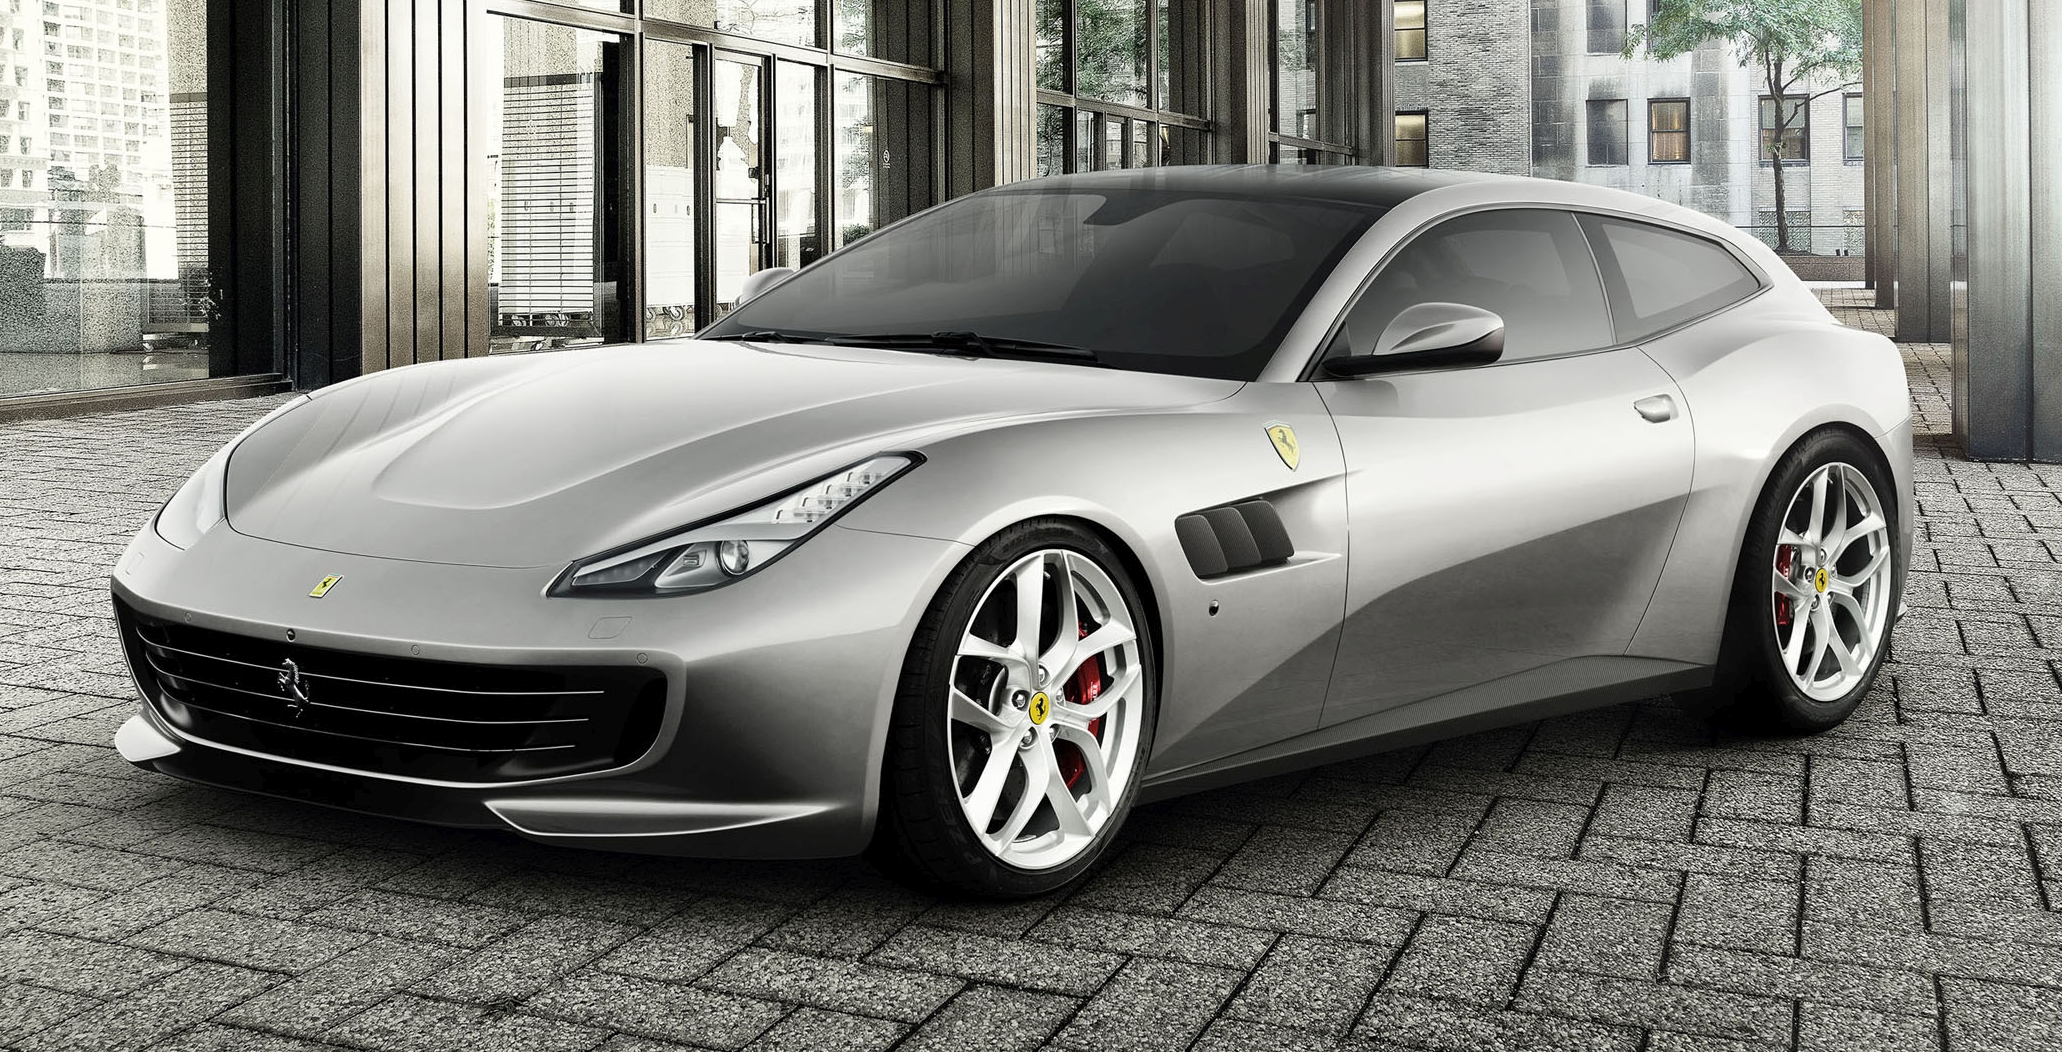 Ferrari Gtc4lusso T The Four Seater Goes V8 Turbo Image